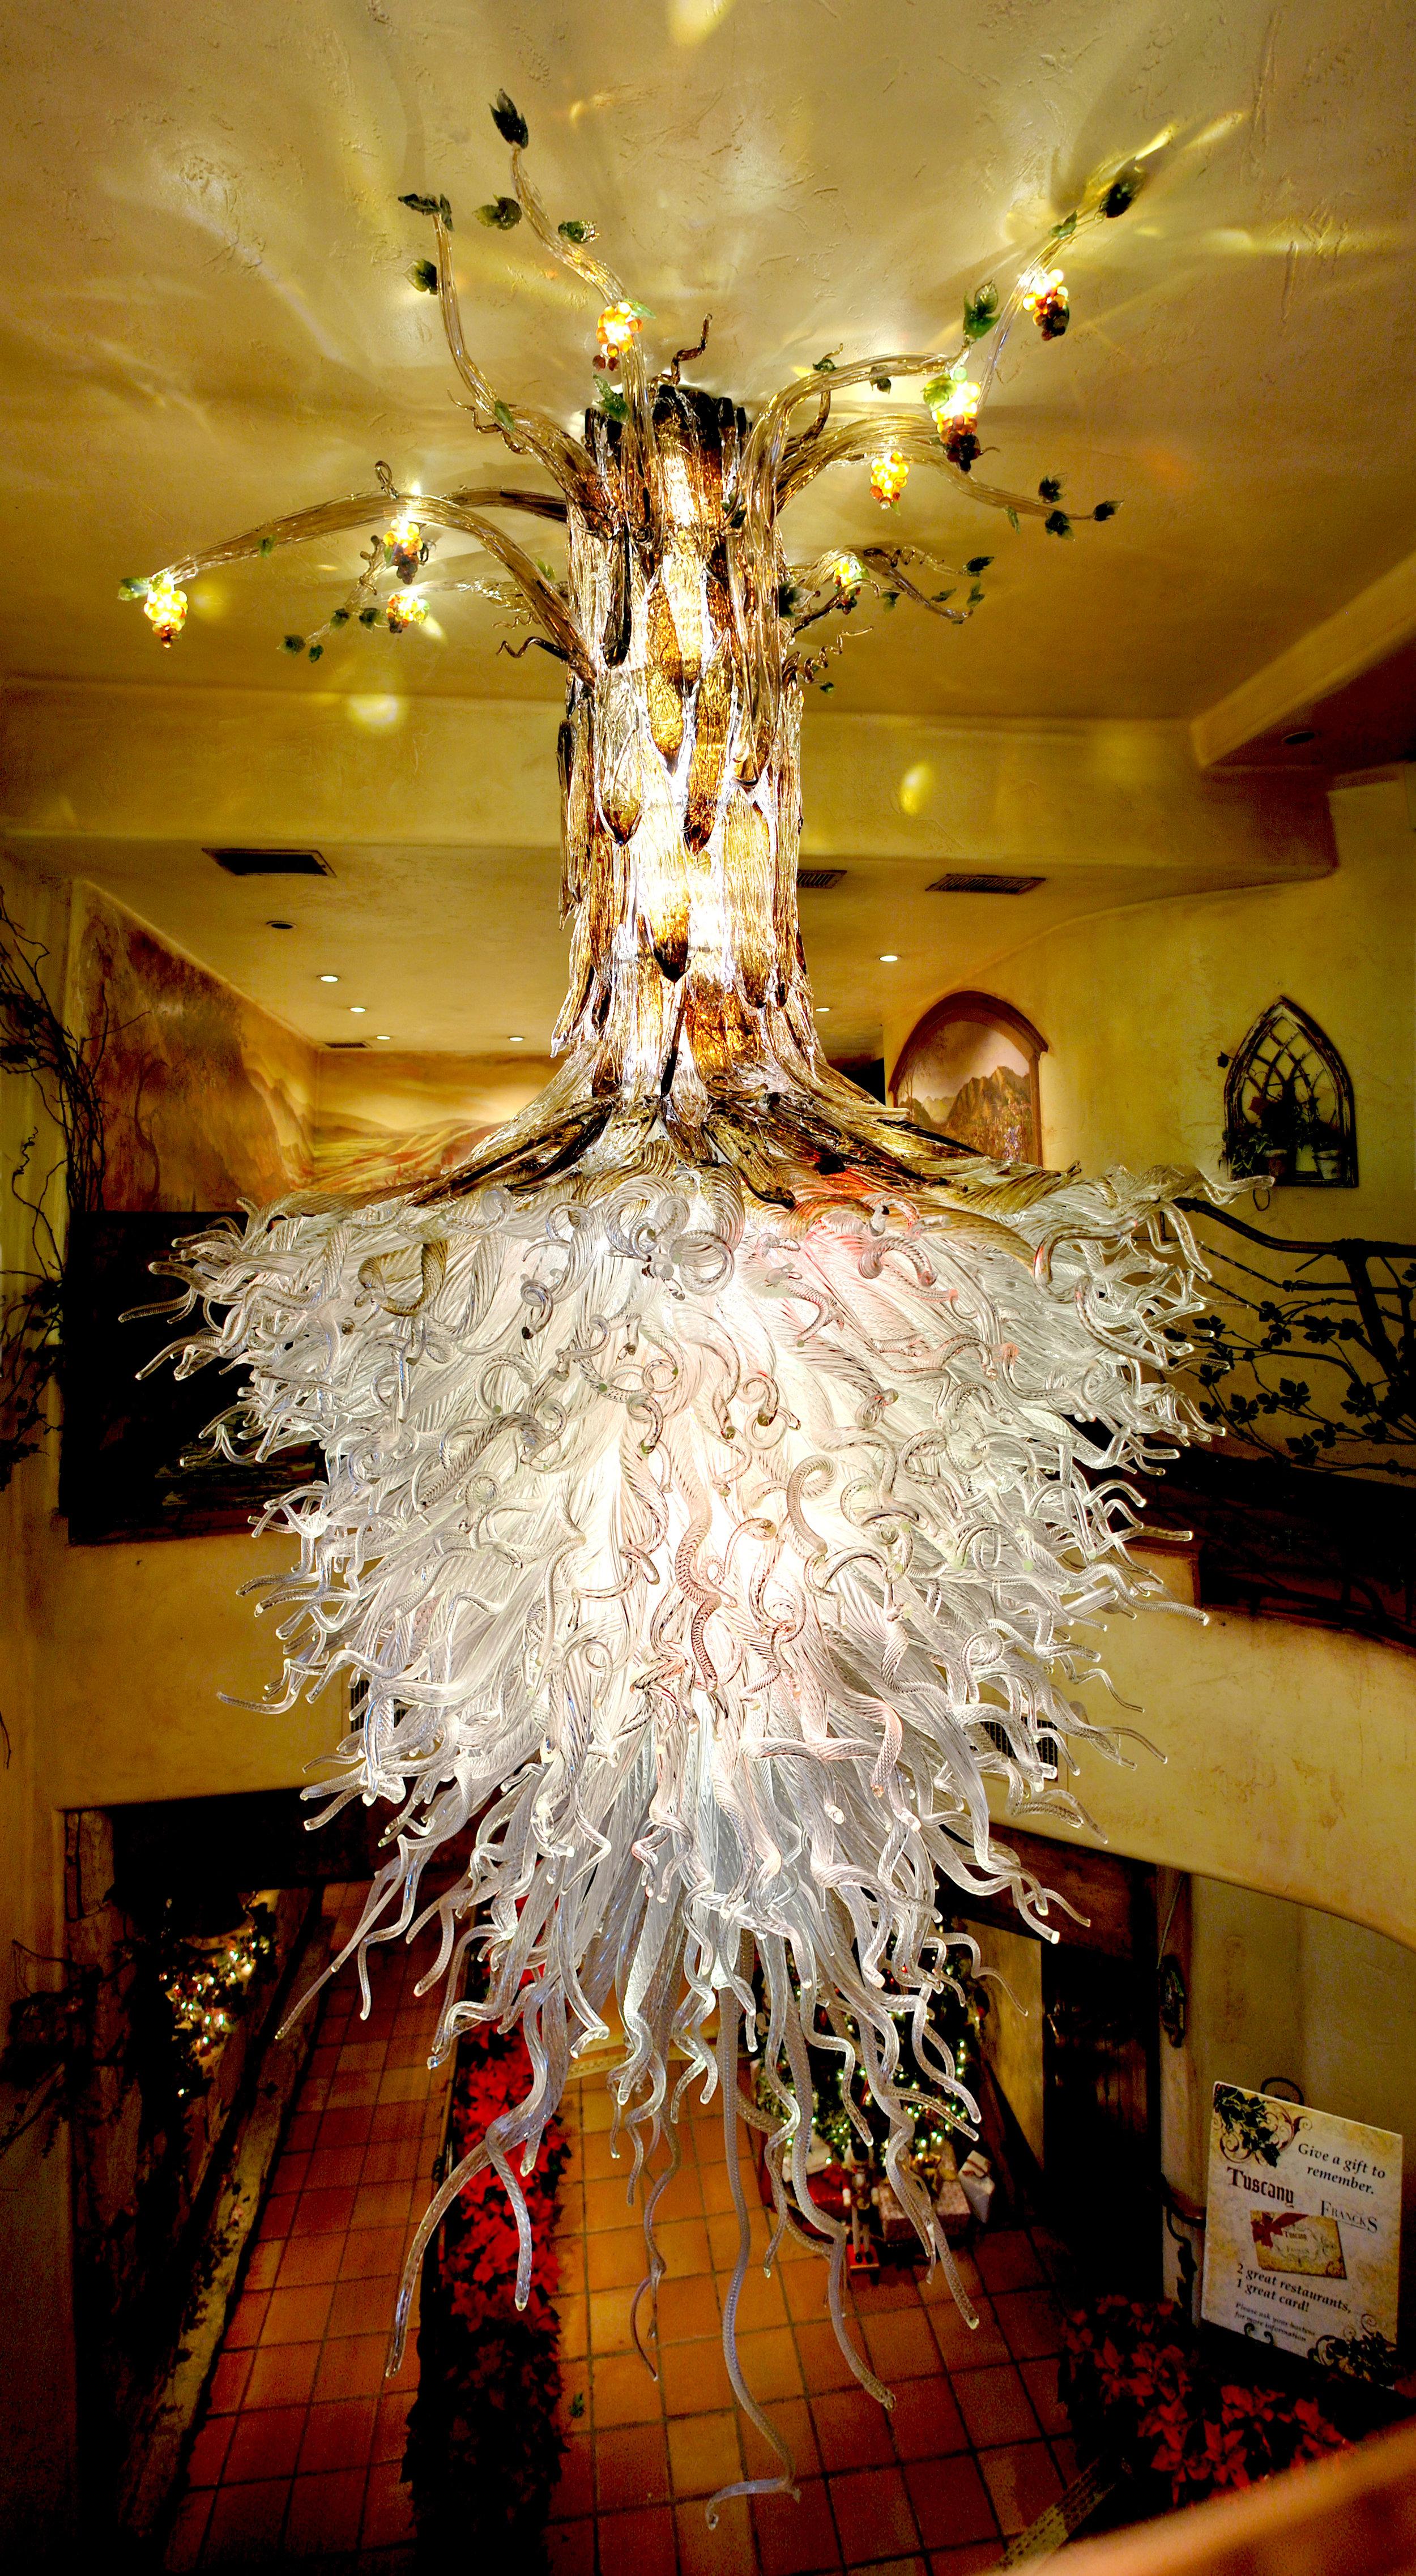 4 Holdman Studio Art and Hot Blown Glass Chandelier Gallery Tuscany Restaurant.jpg